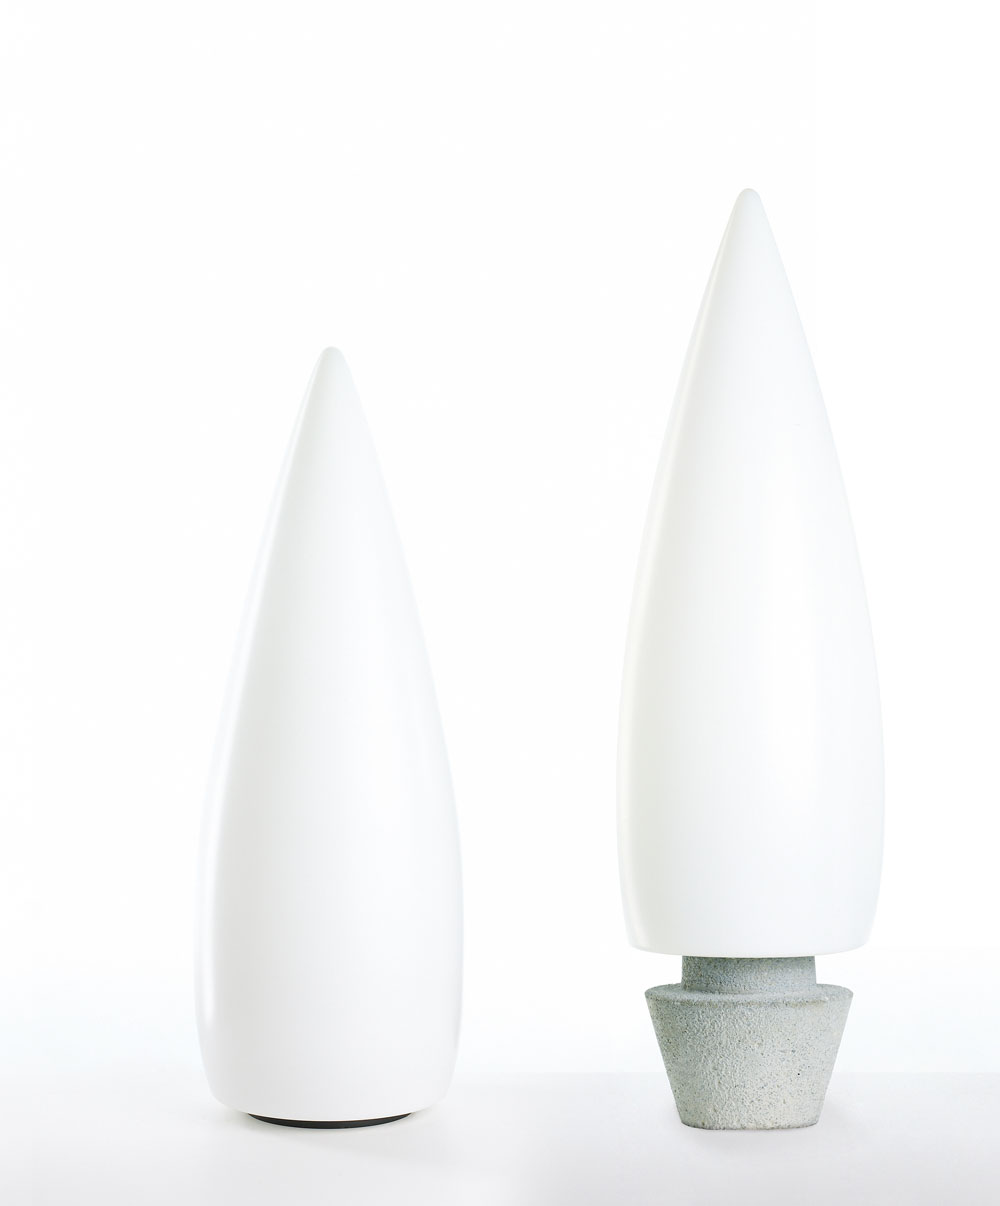 Kanpazar 150B Lampada da terra 2G11 2x55w - bianco opale